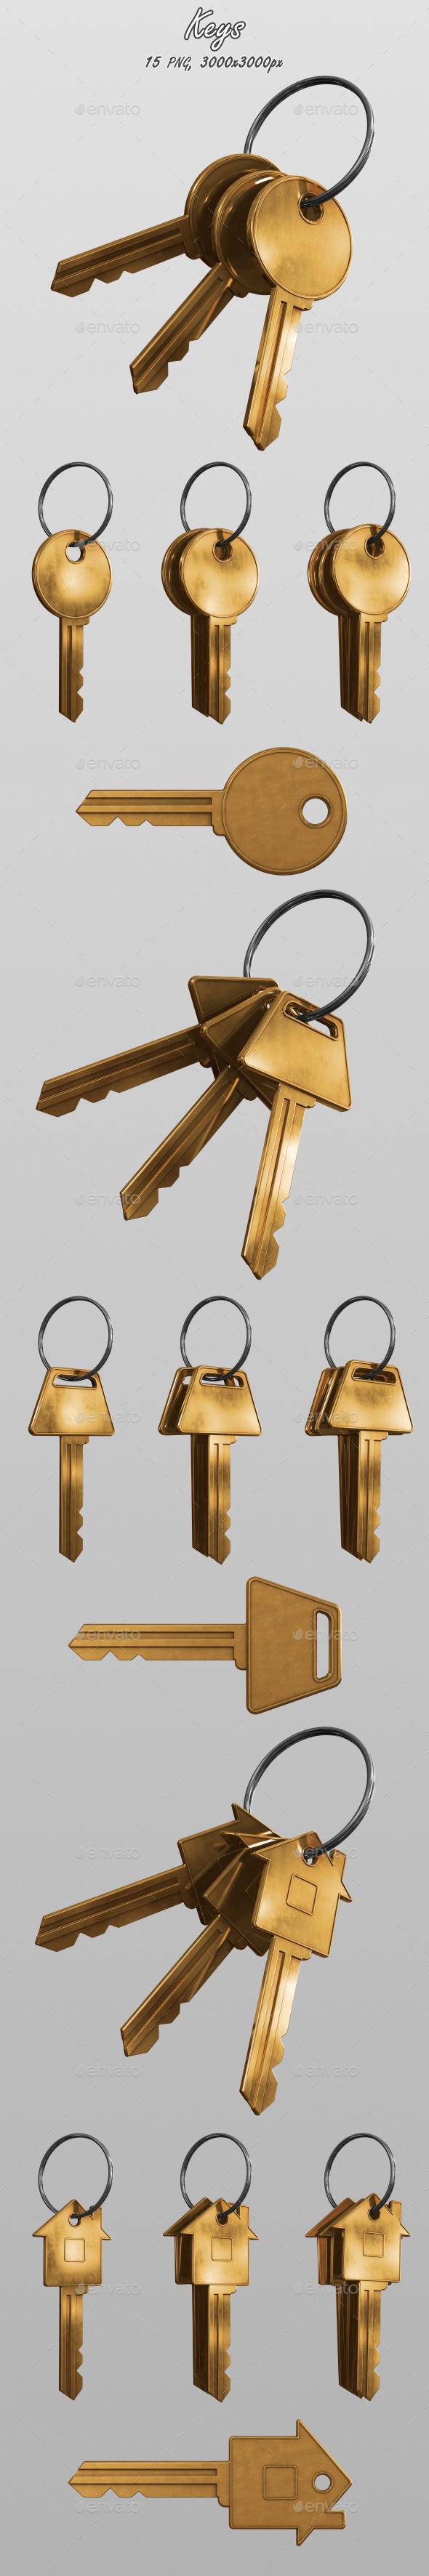 GraphicRiver Keys 10870316